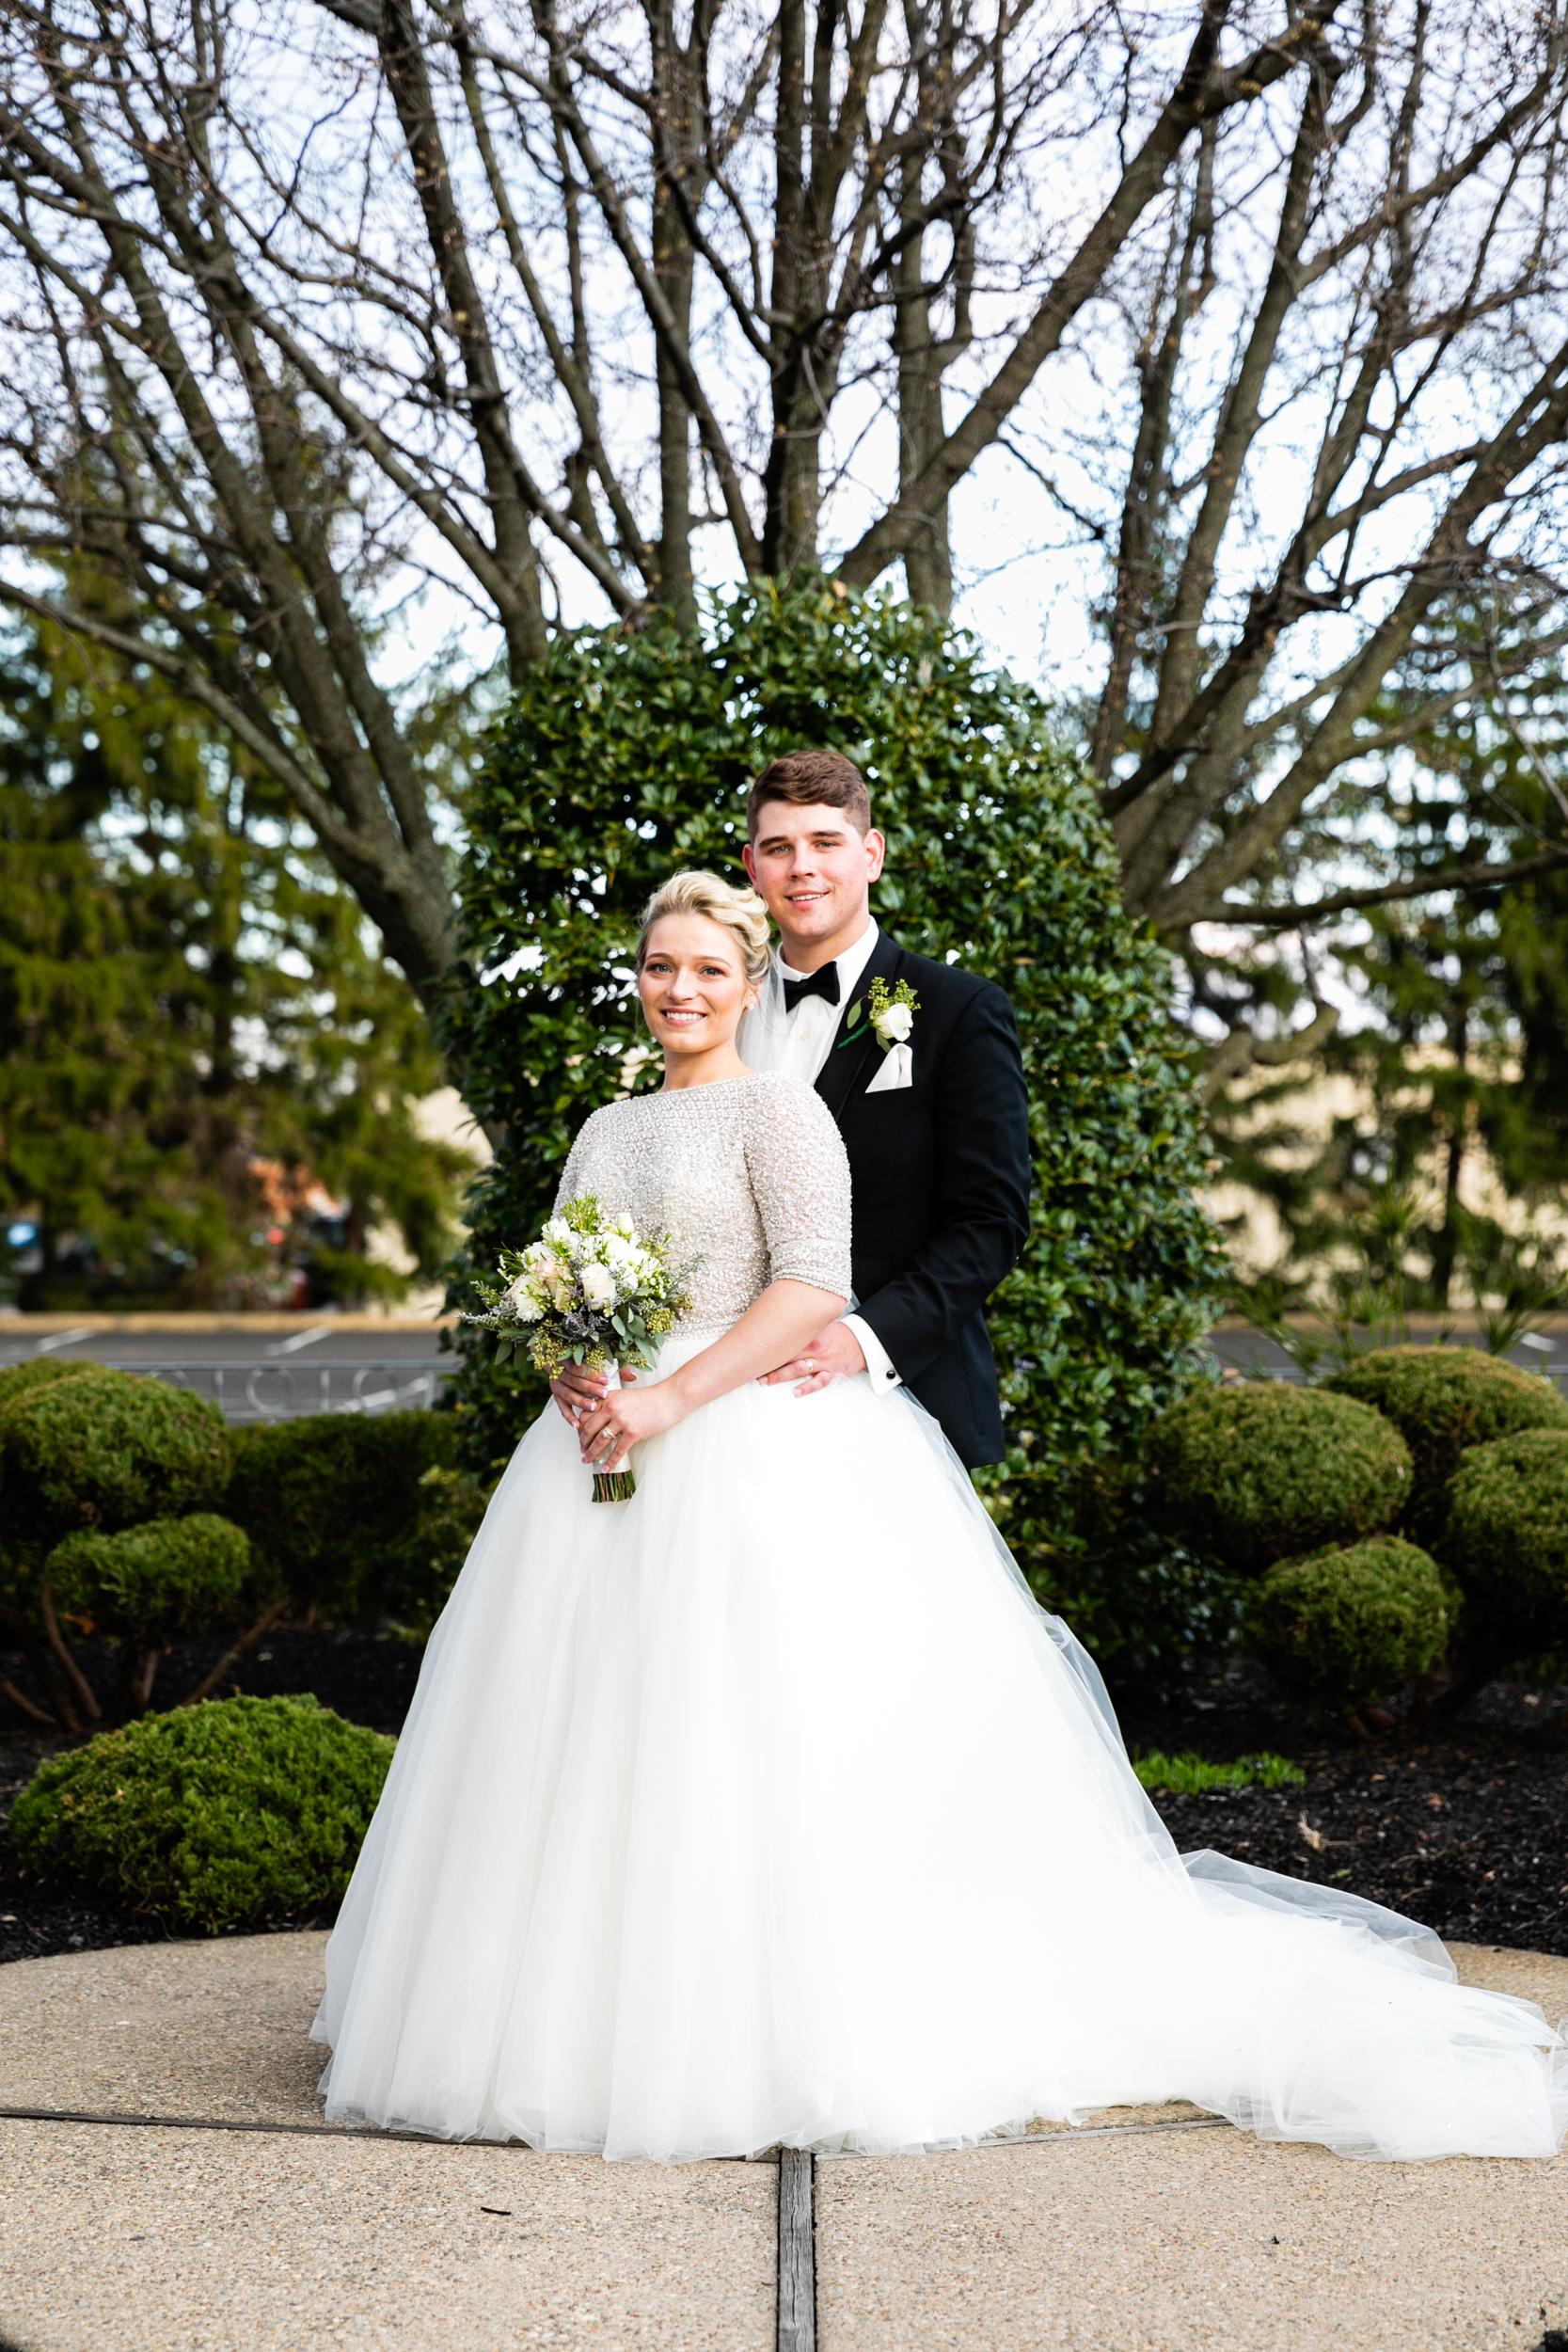 CELEBRATIONS BENSALEM WEDDING PHOTOGRAPHY-67.jpg